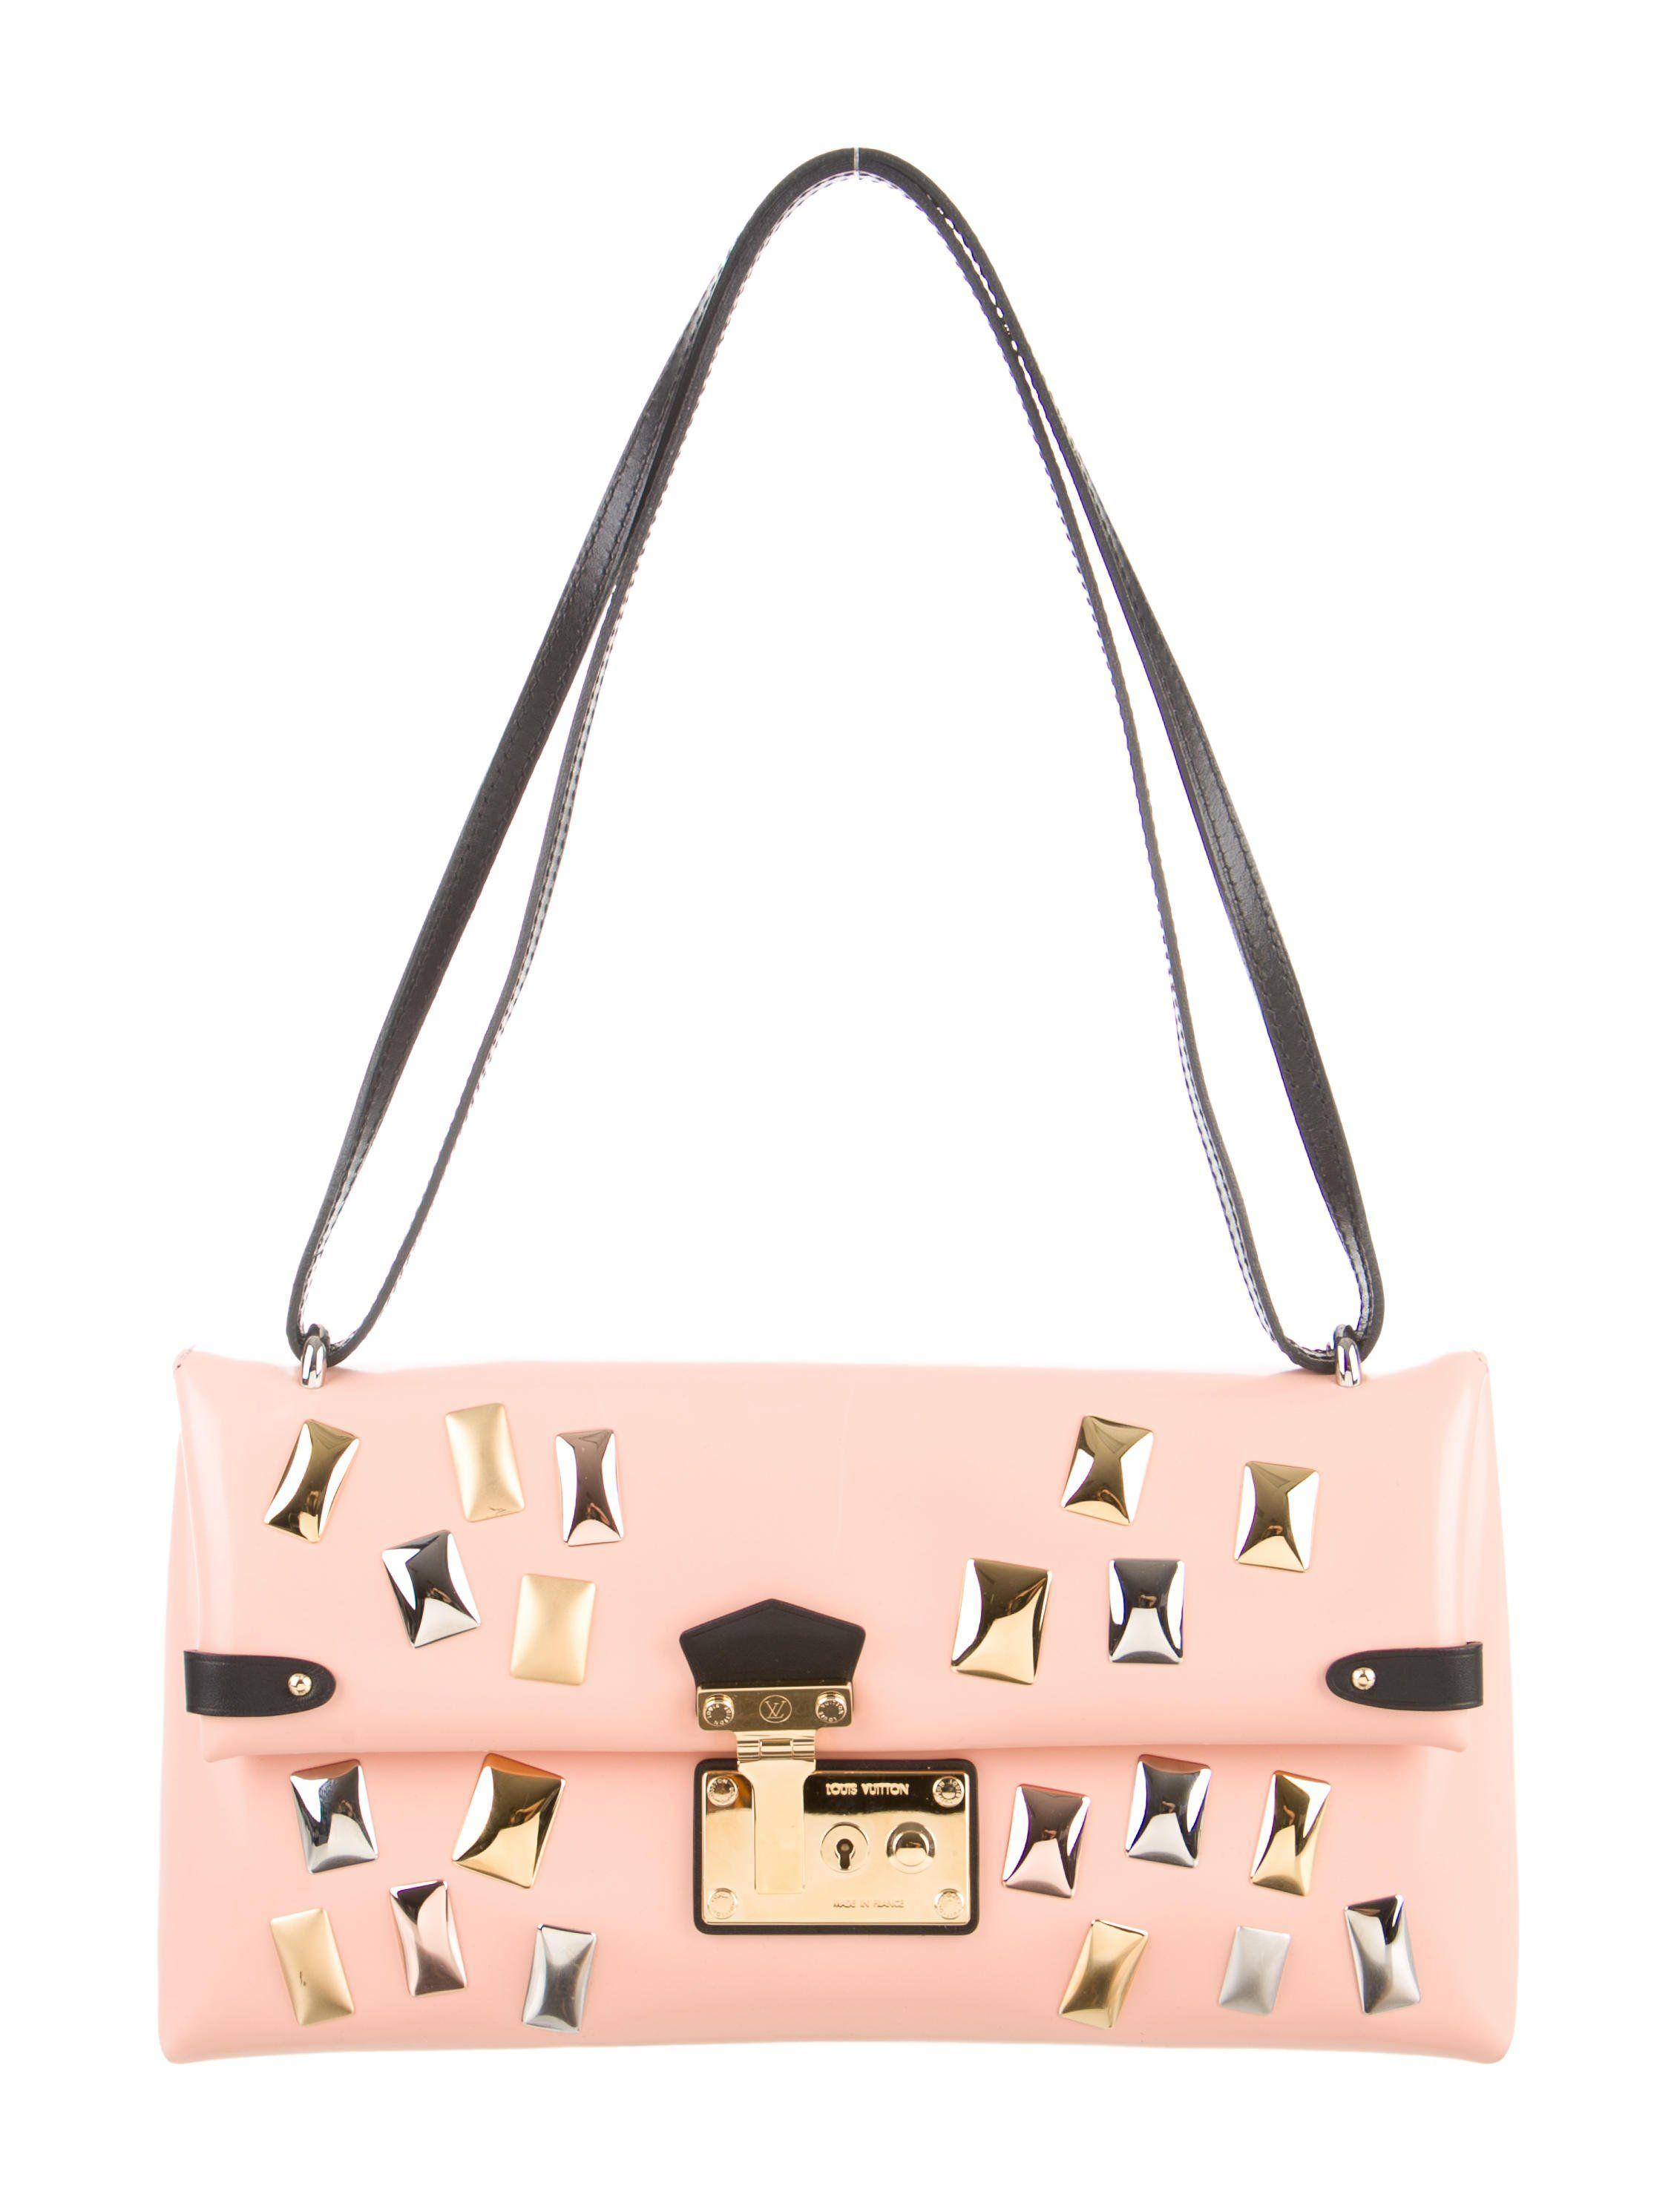 Louis Vuitton 2015 Sac Triangle PM - Handbags - LOU74713   The RealReal 54440220ab9